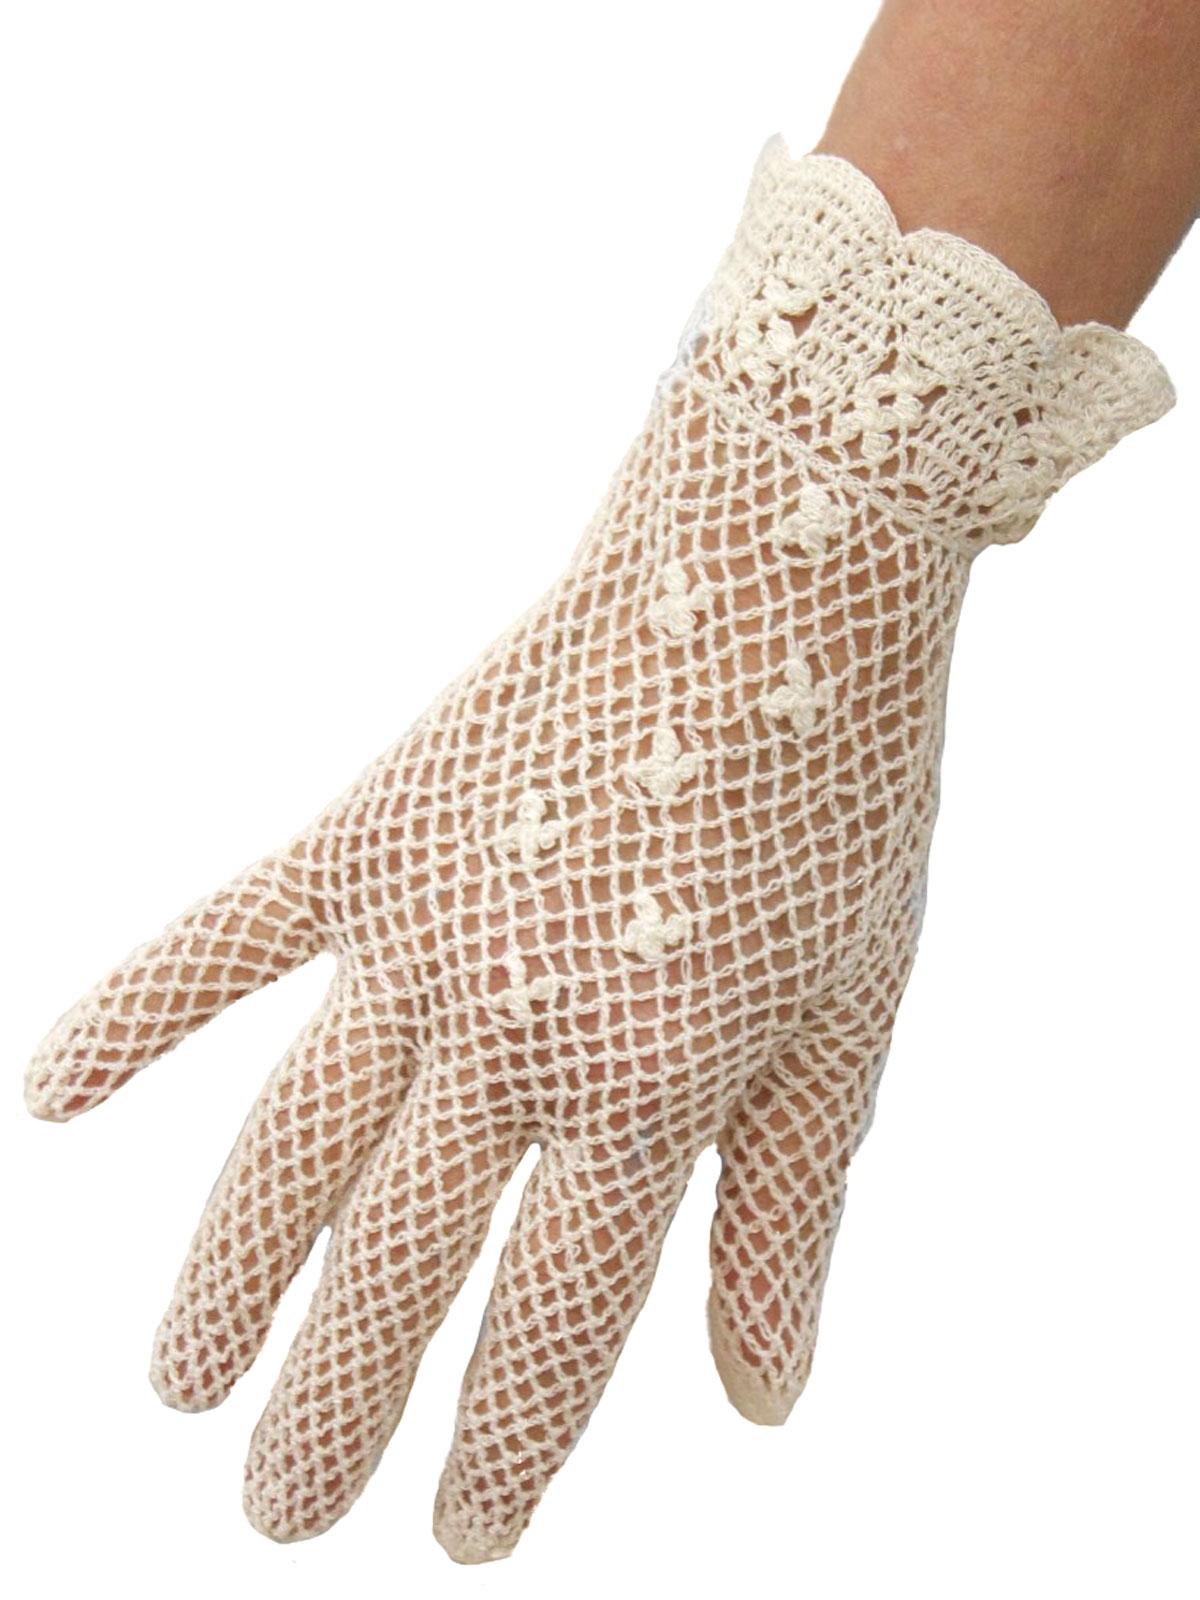 Dents Cotton Crochet Short Dress Gloves